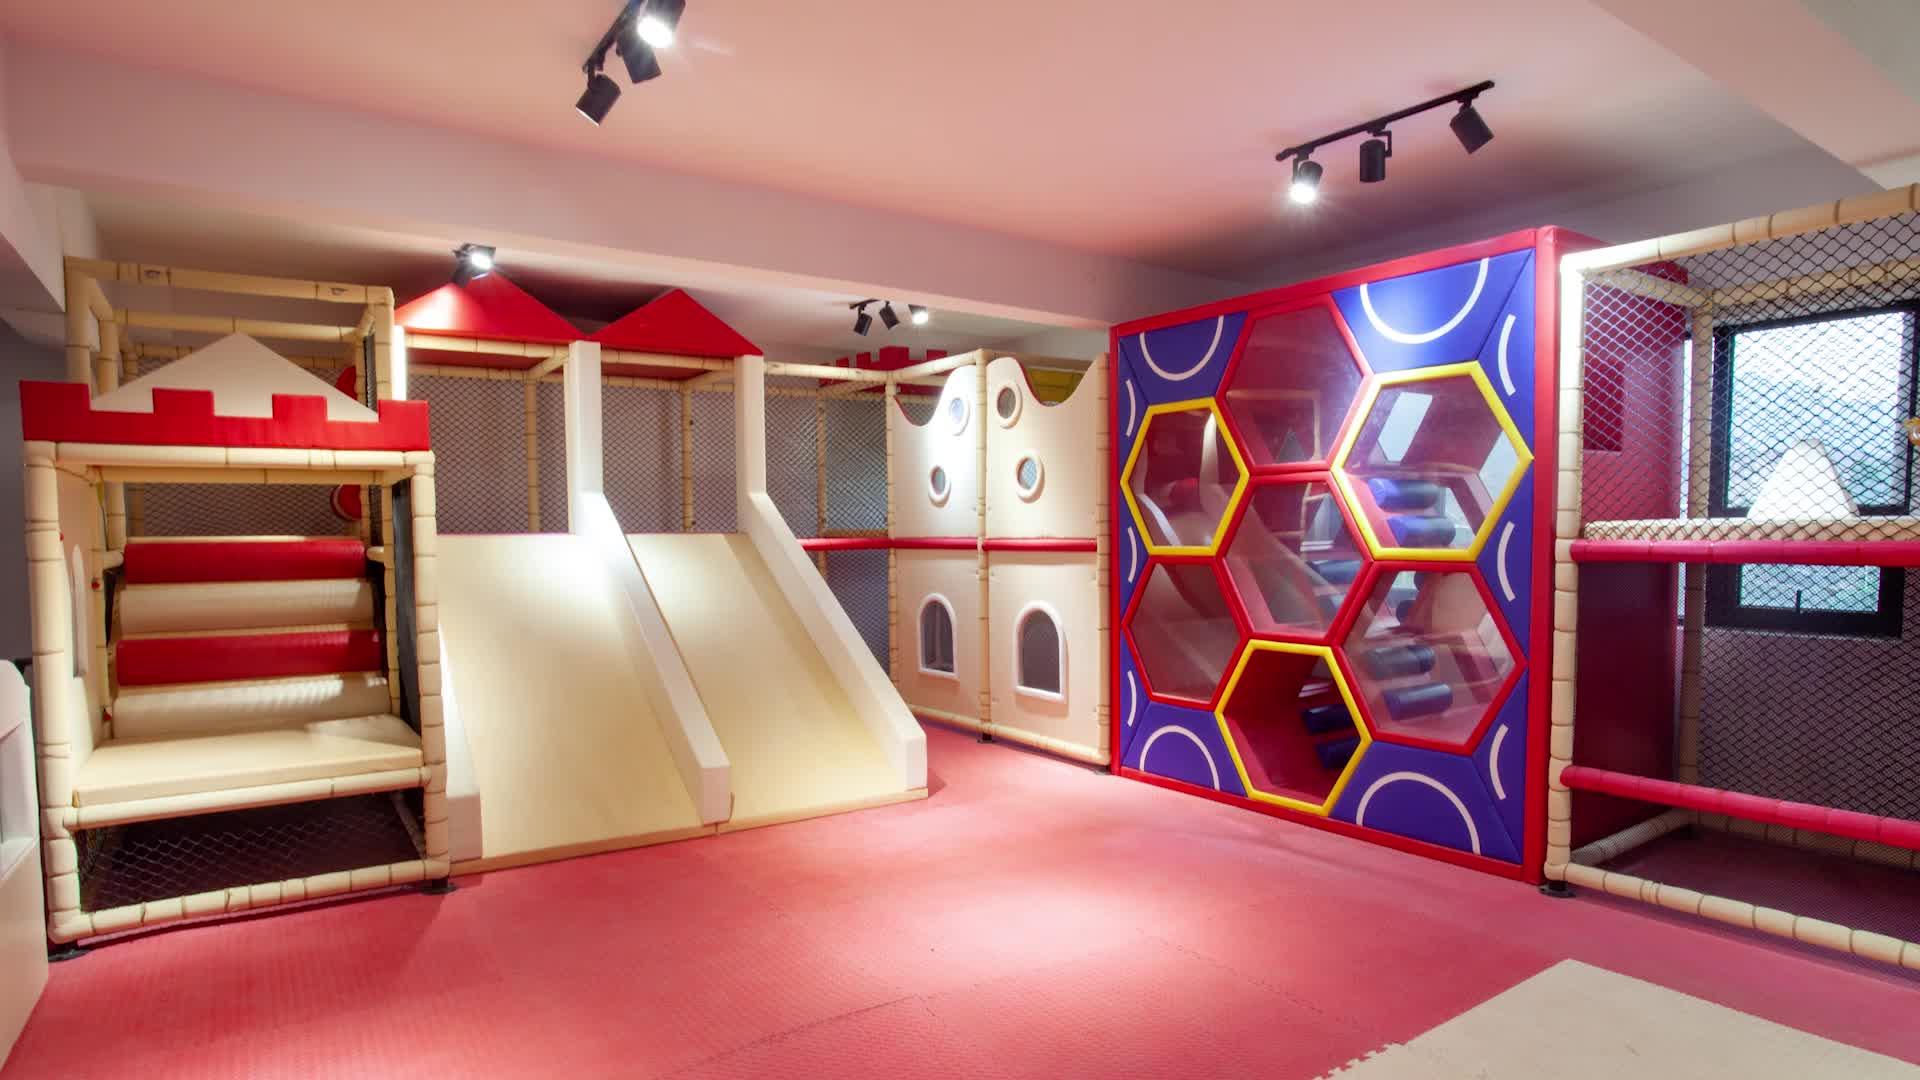 CE Children Soft Playground Commercial Indoor Playground Equipment